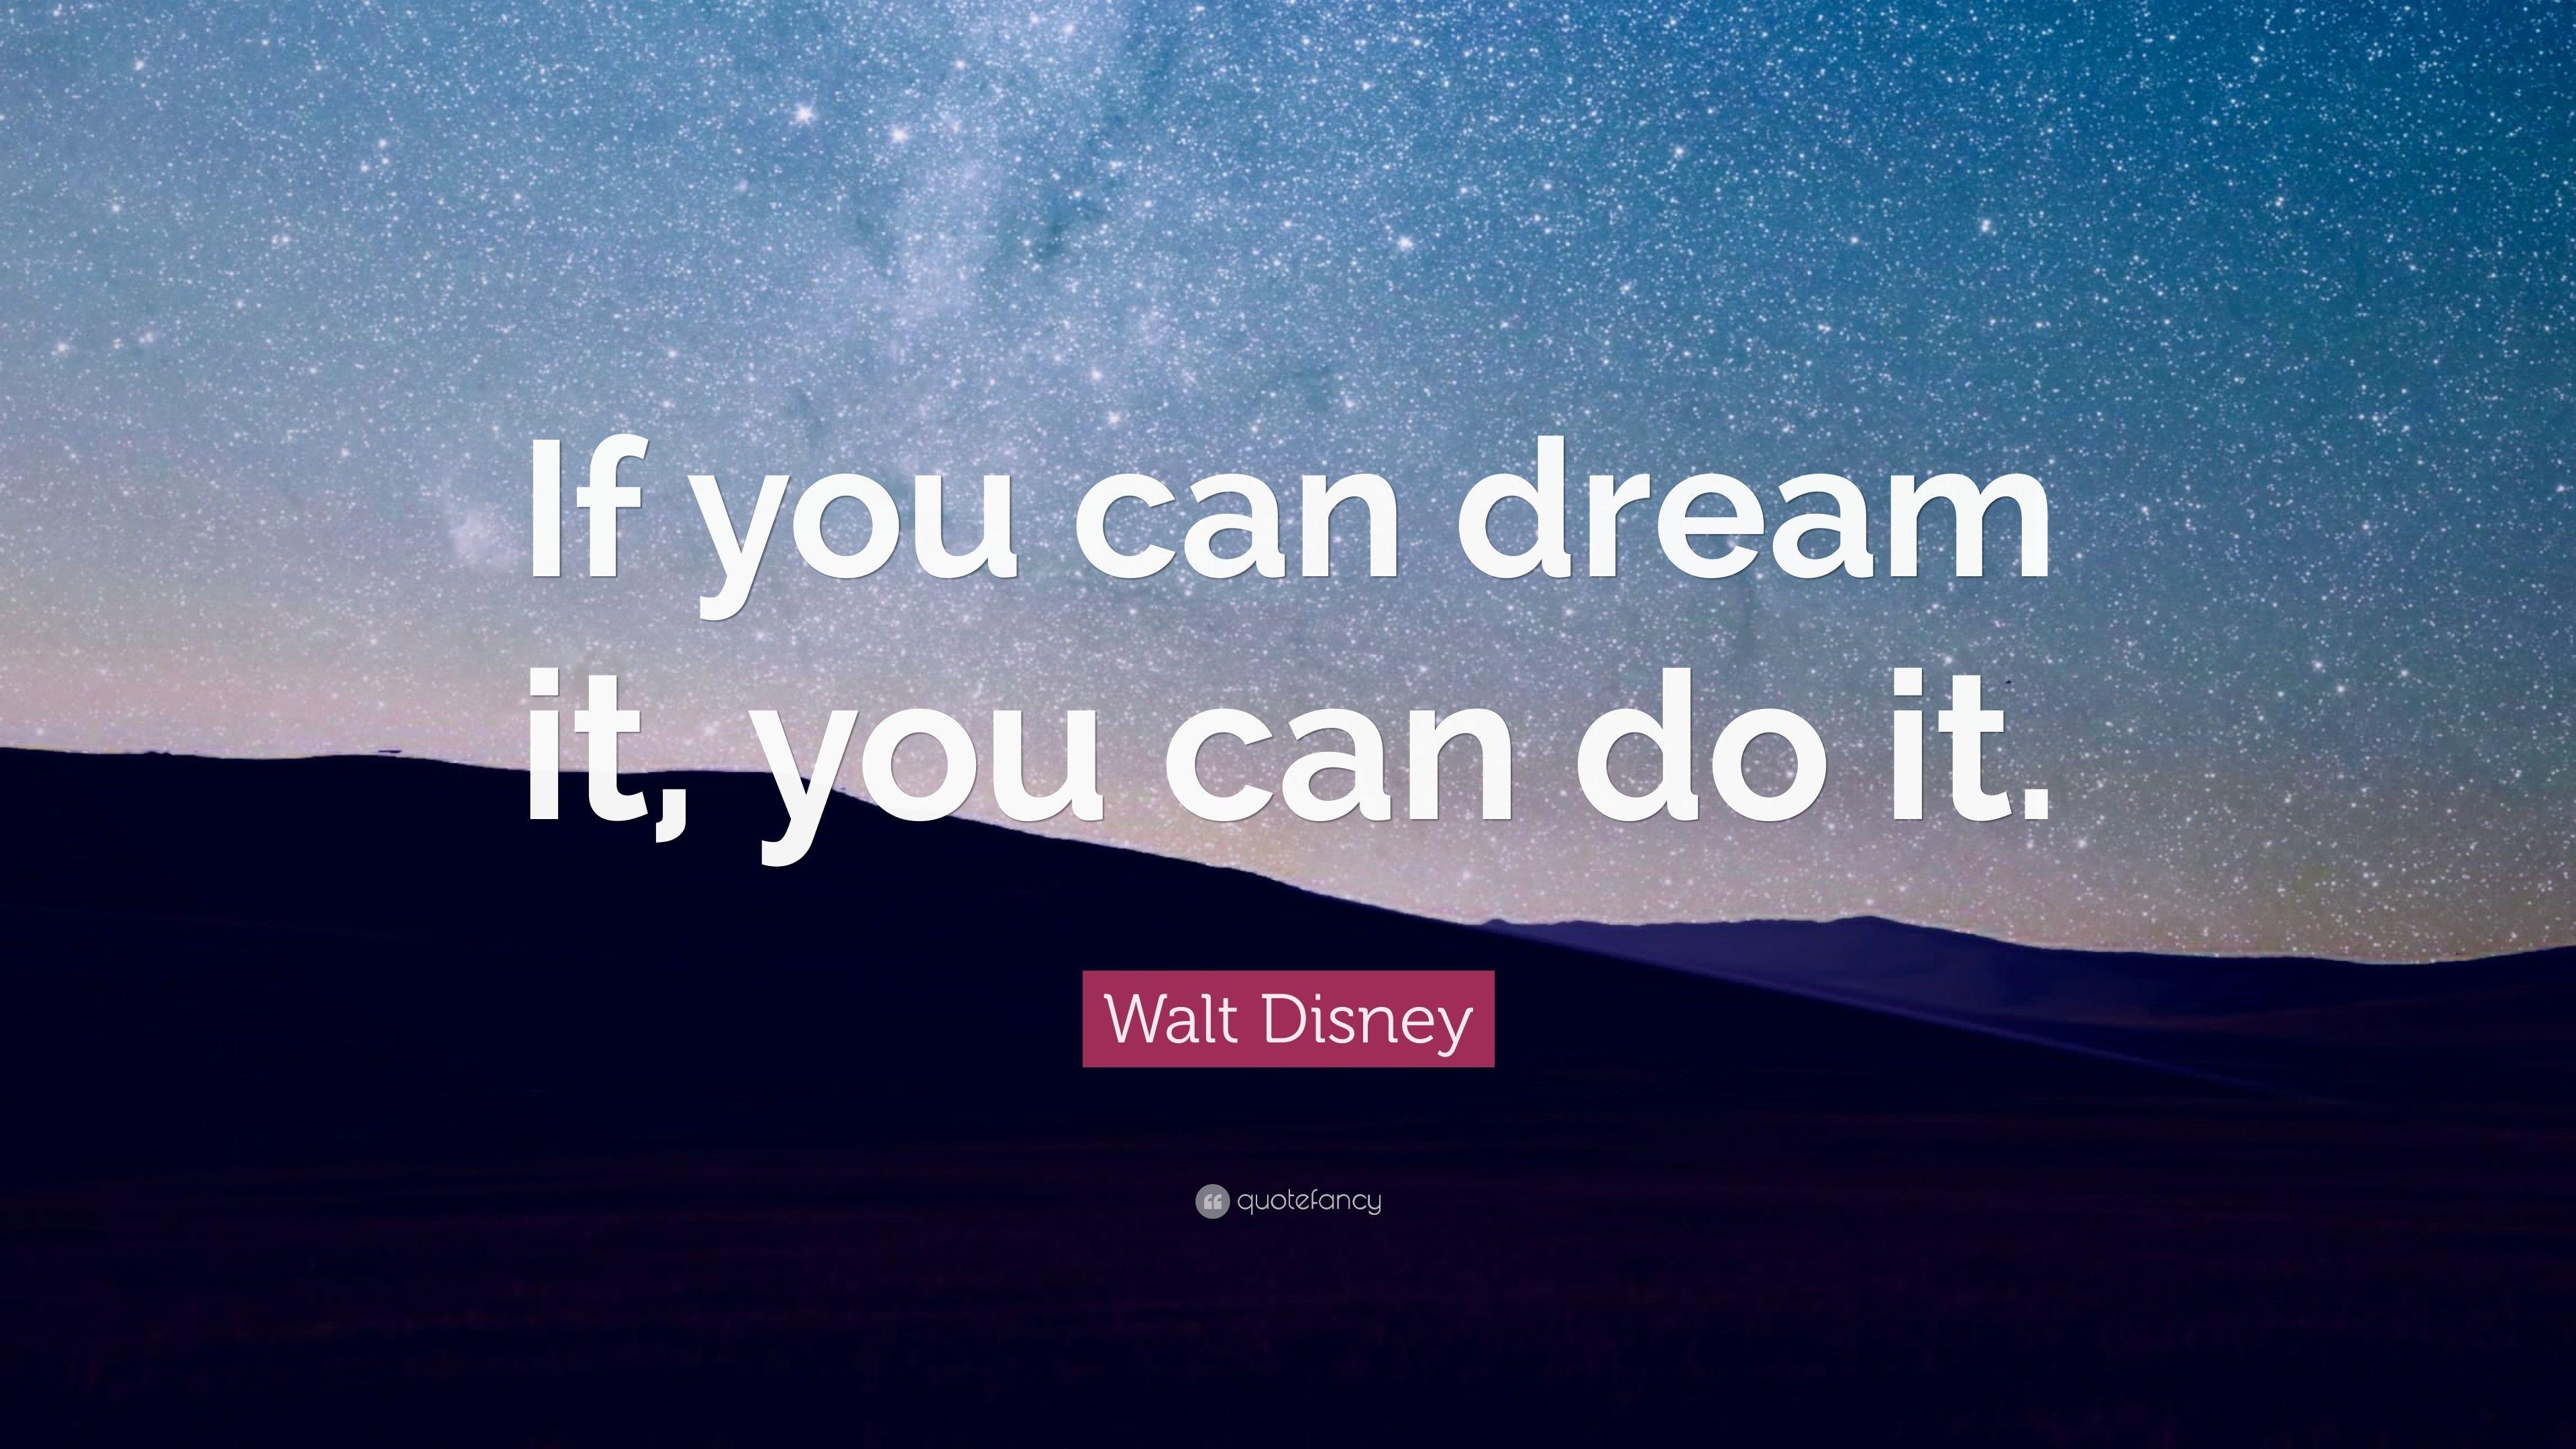 Disney Quotes Desktop Wallpaper   Data-src /full/735819 - Van Gogh Quotes About Night - HD Wallpaper